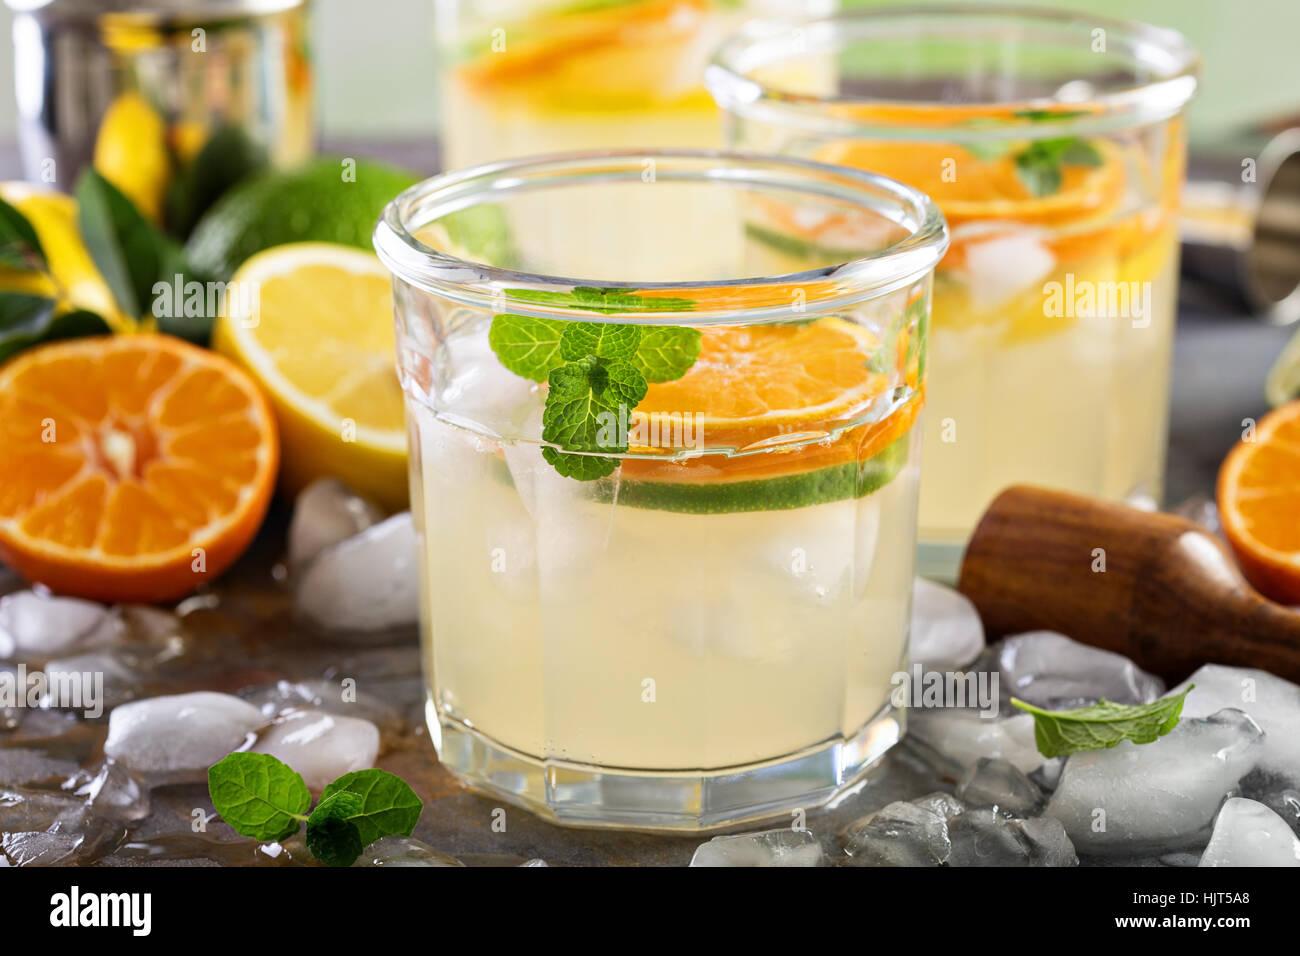 Verano refrescante cóctel con cítricos Imagen De Stock